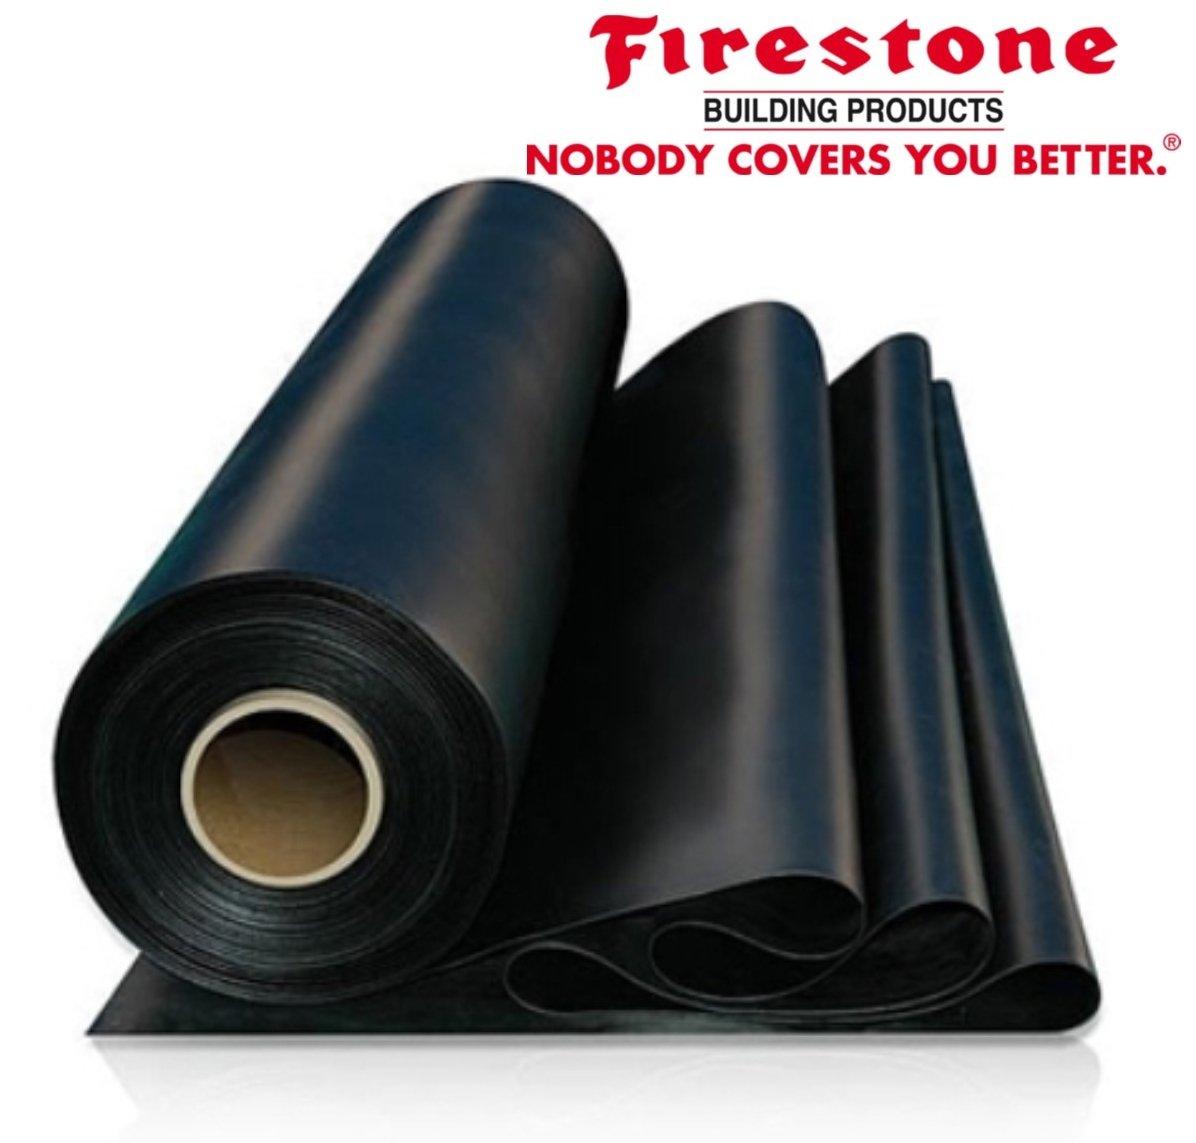 5 X 20 Firestone Rubbergard 45 Mil Epdm Roofing Rubber